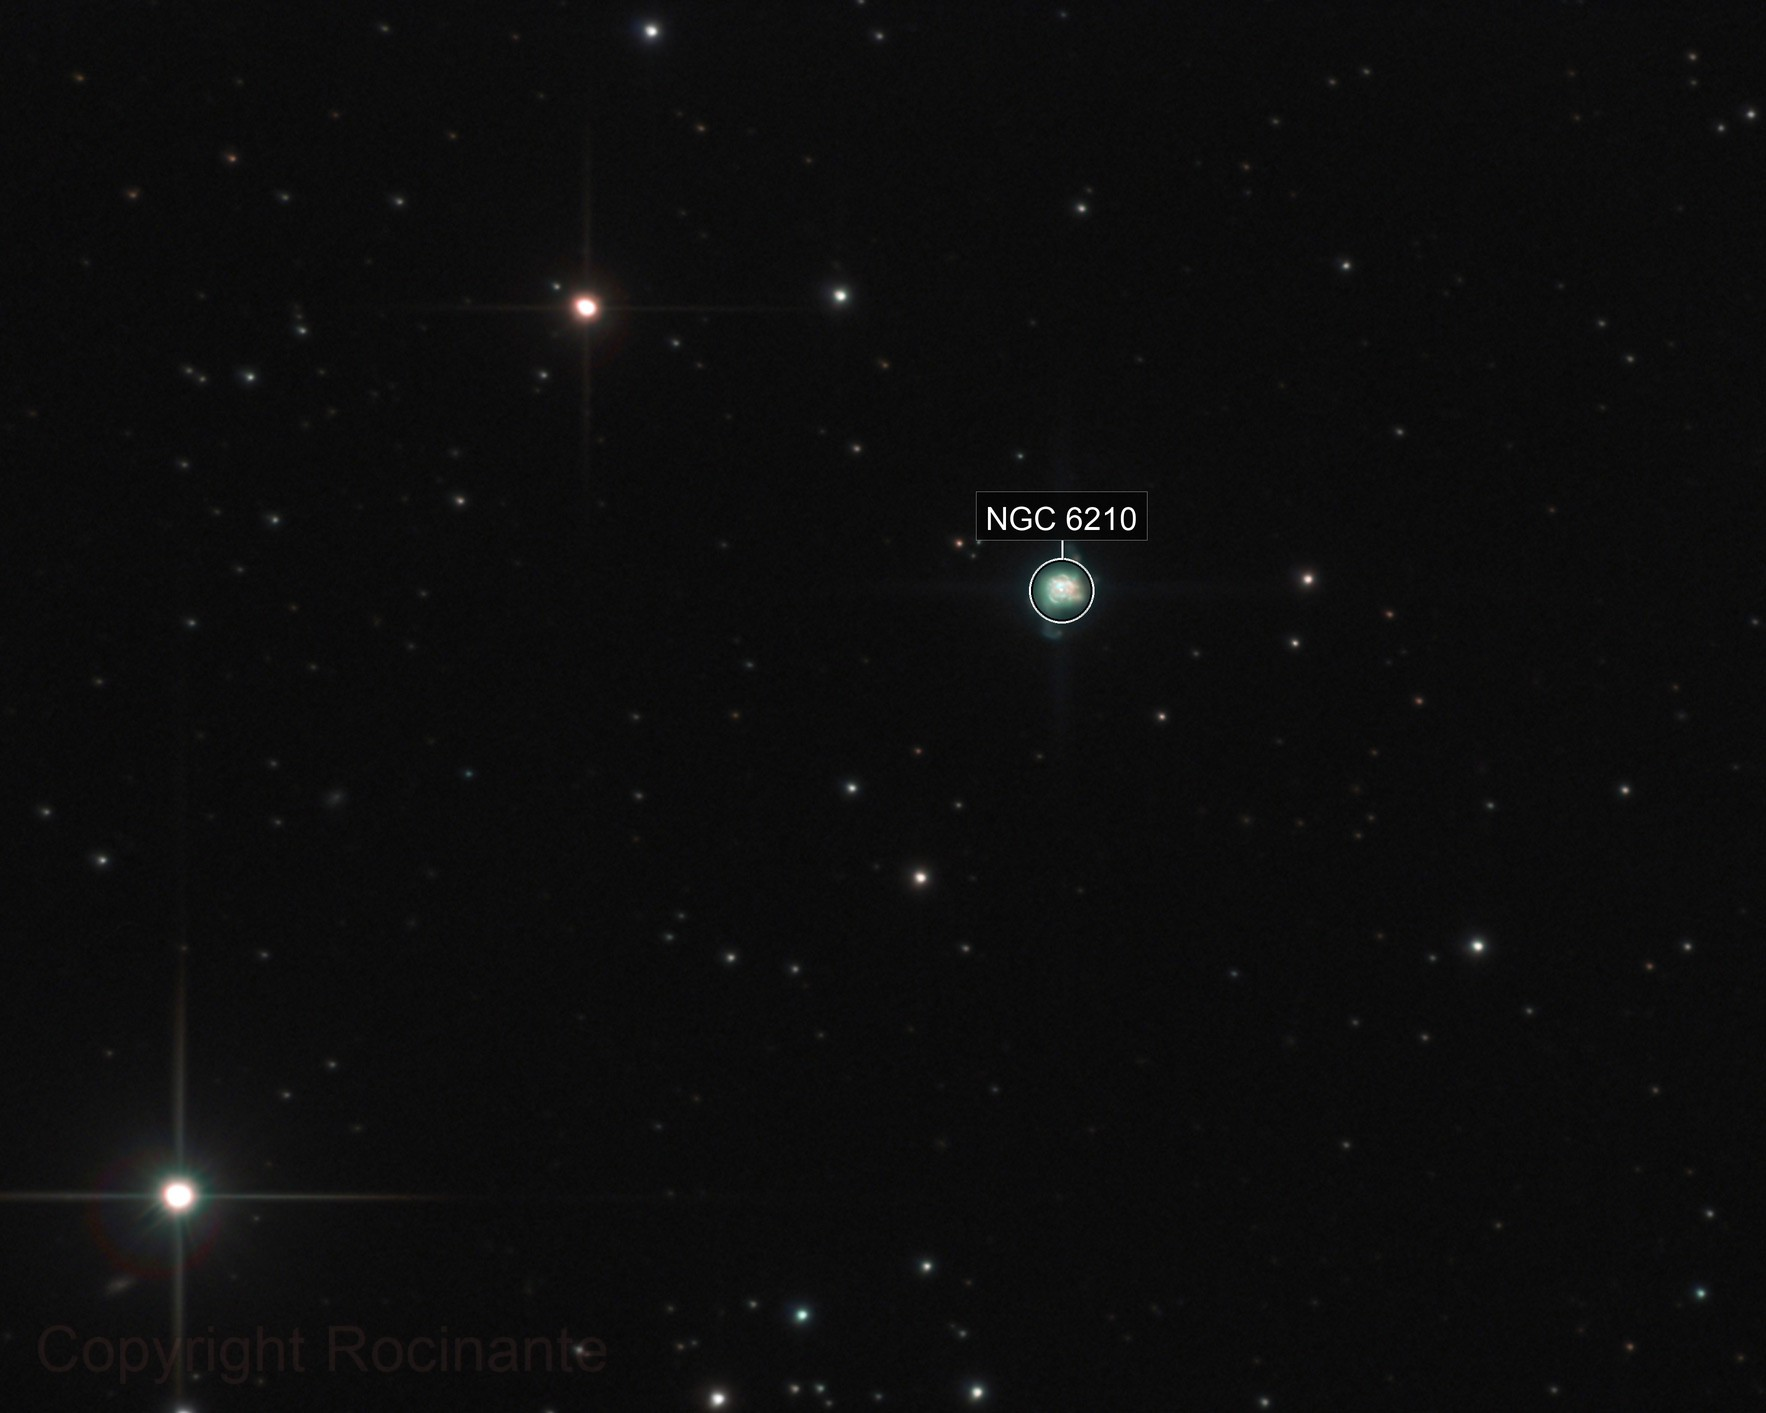 NGC 6210 - The Turtle